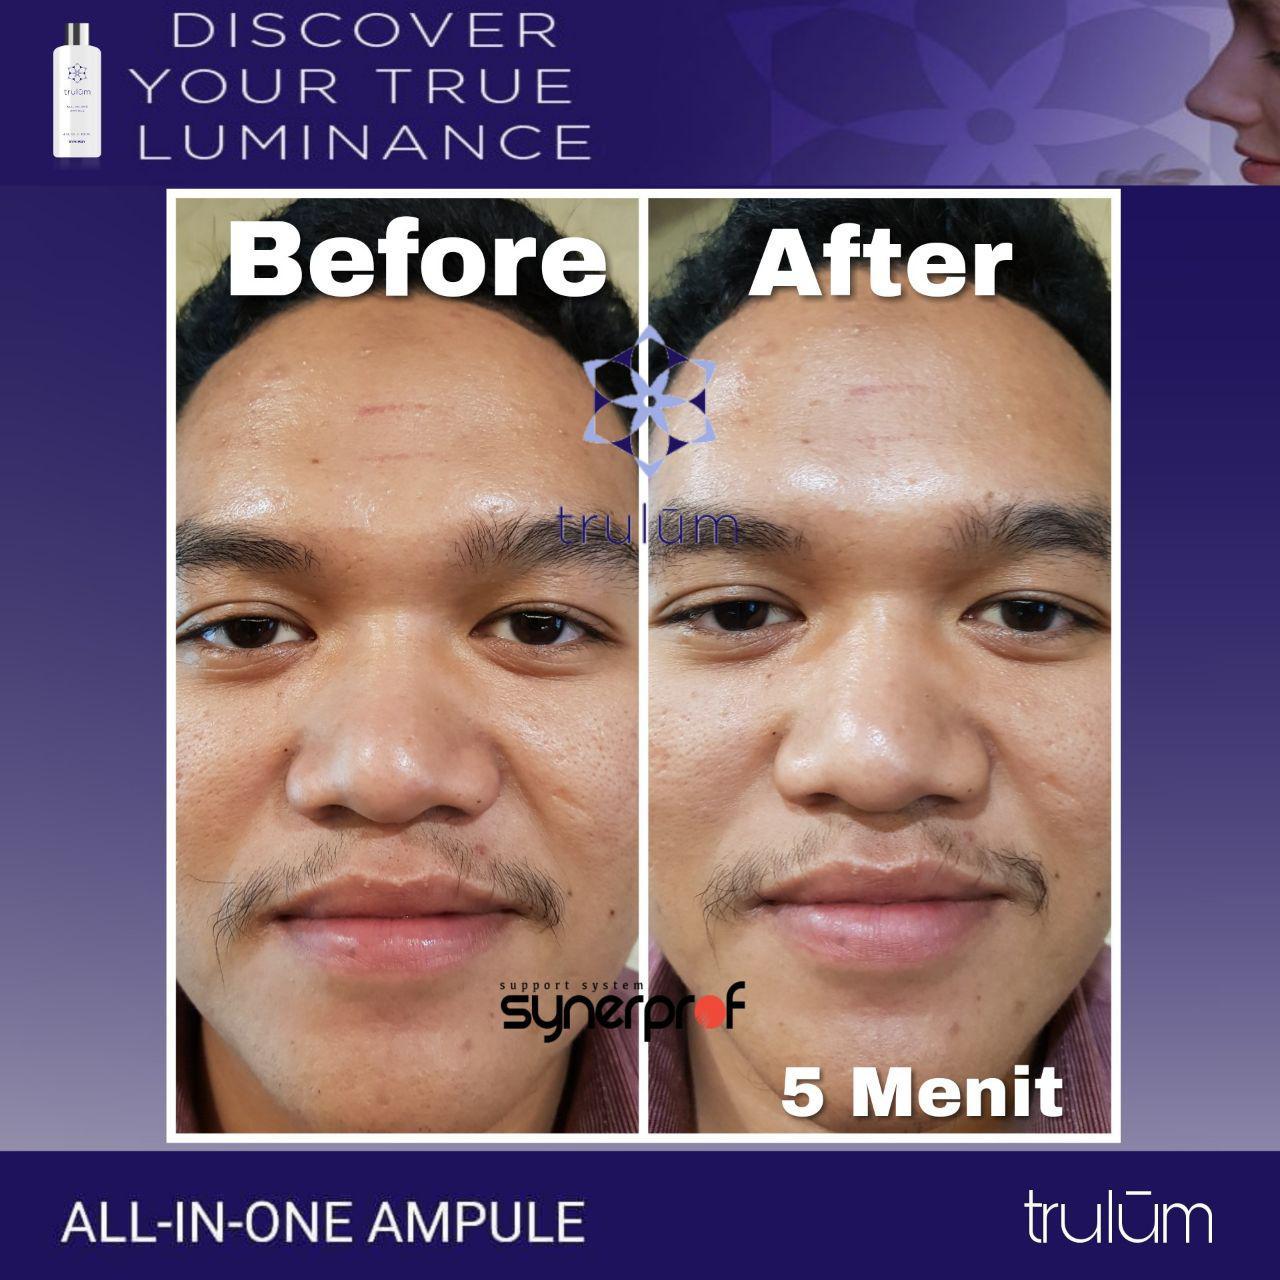 Klinik Kecantikan Trulum Skincare Synergy Di Ulee Pata, Jaya Baru WA: 08112338376